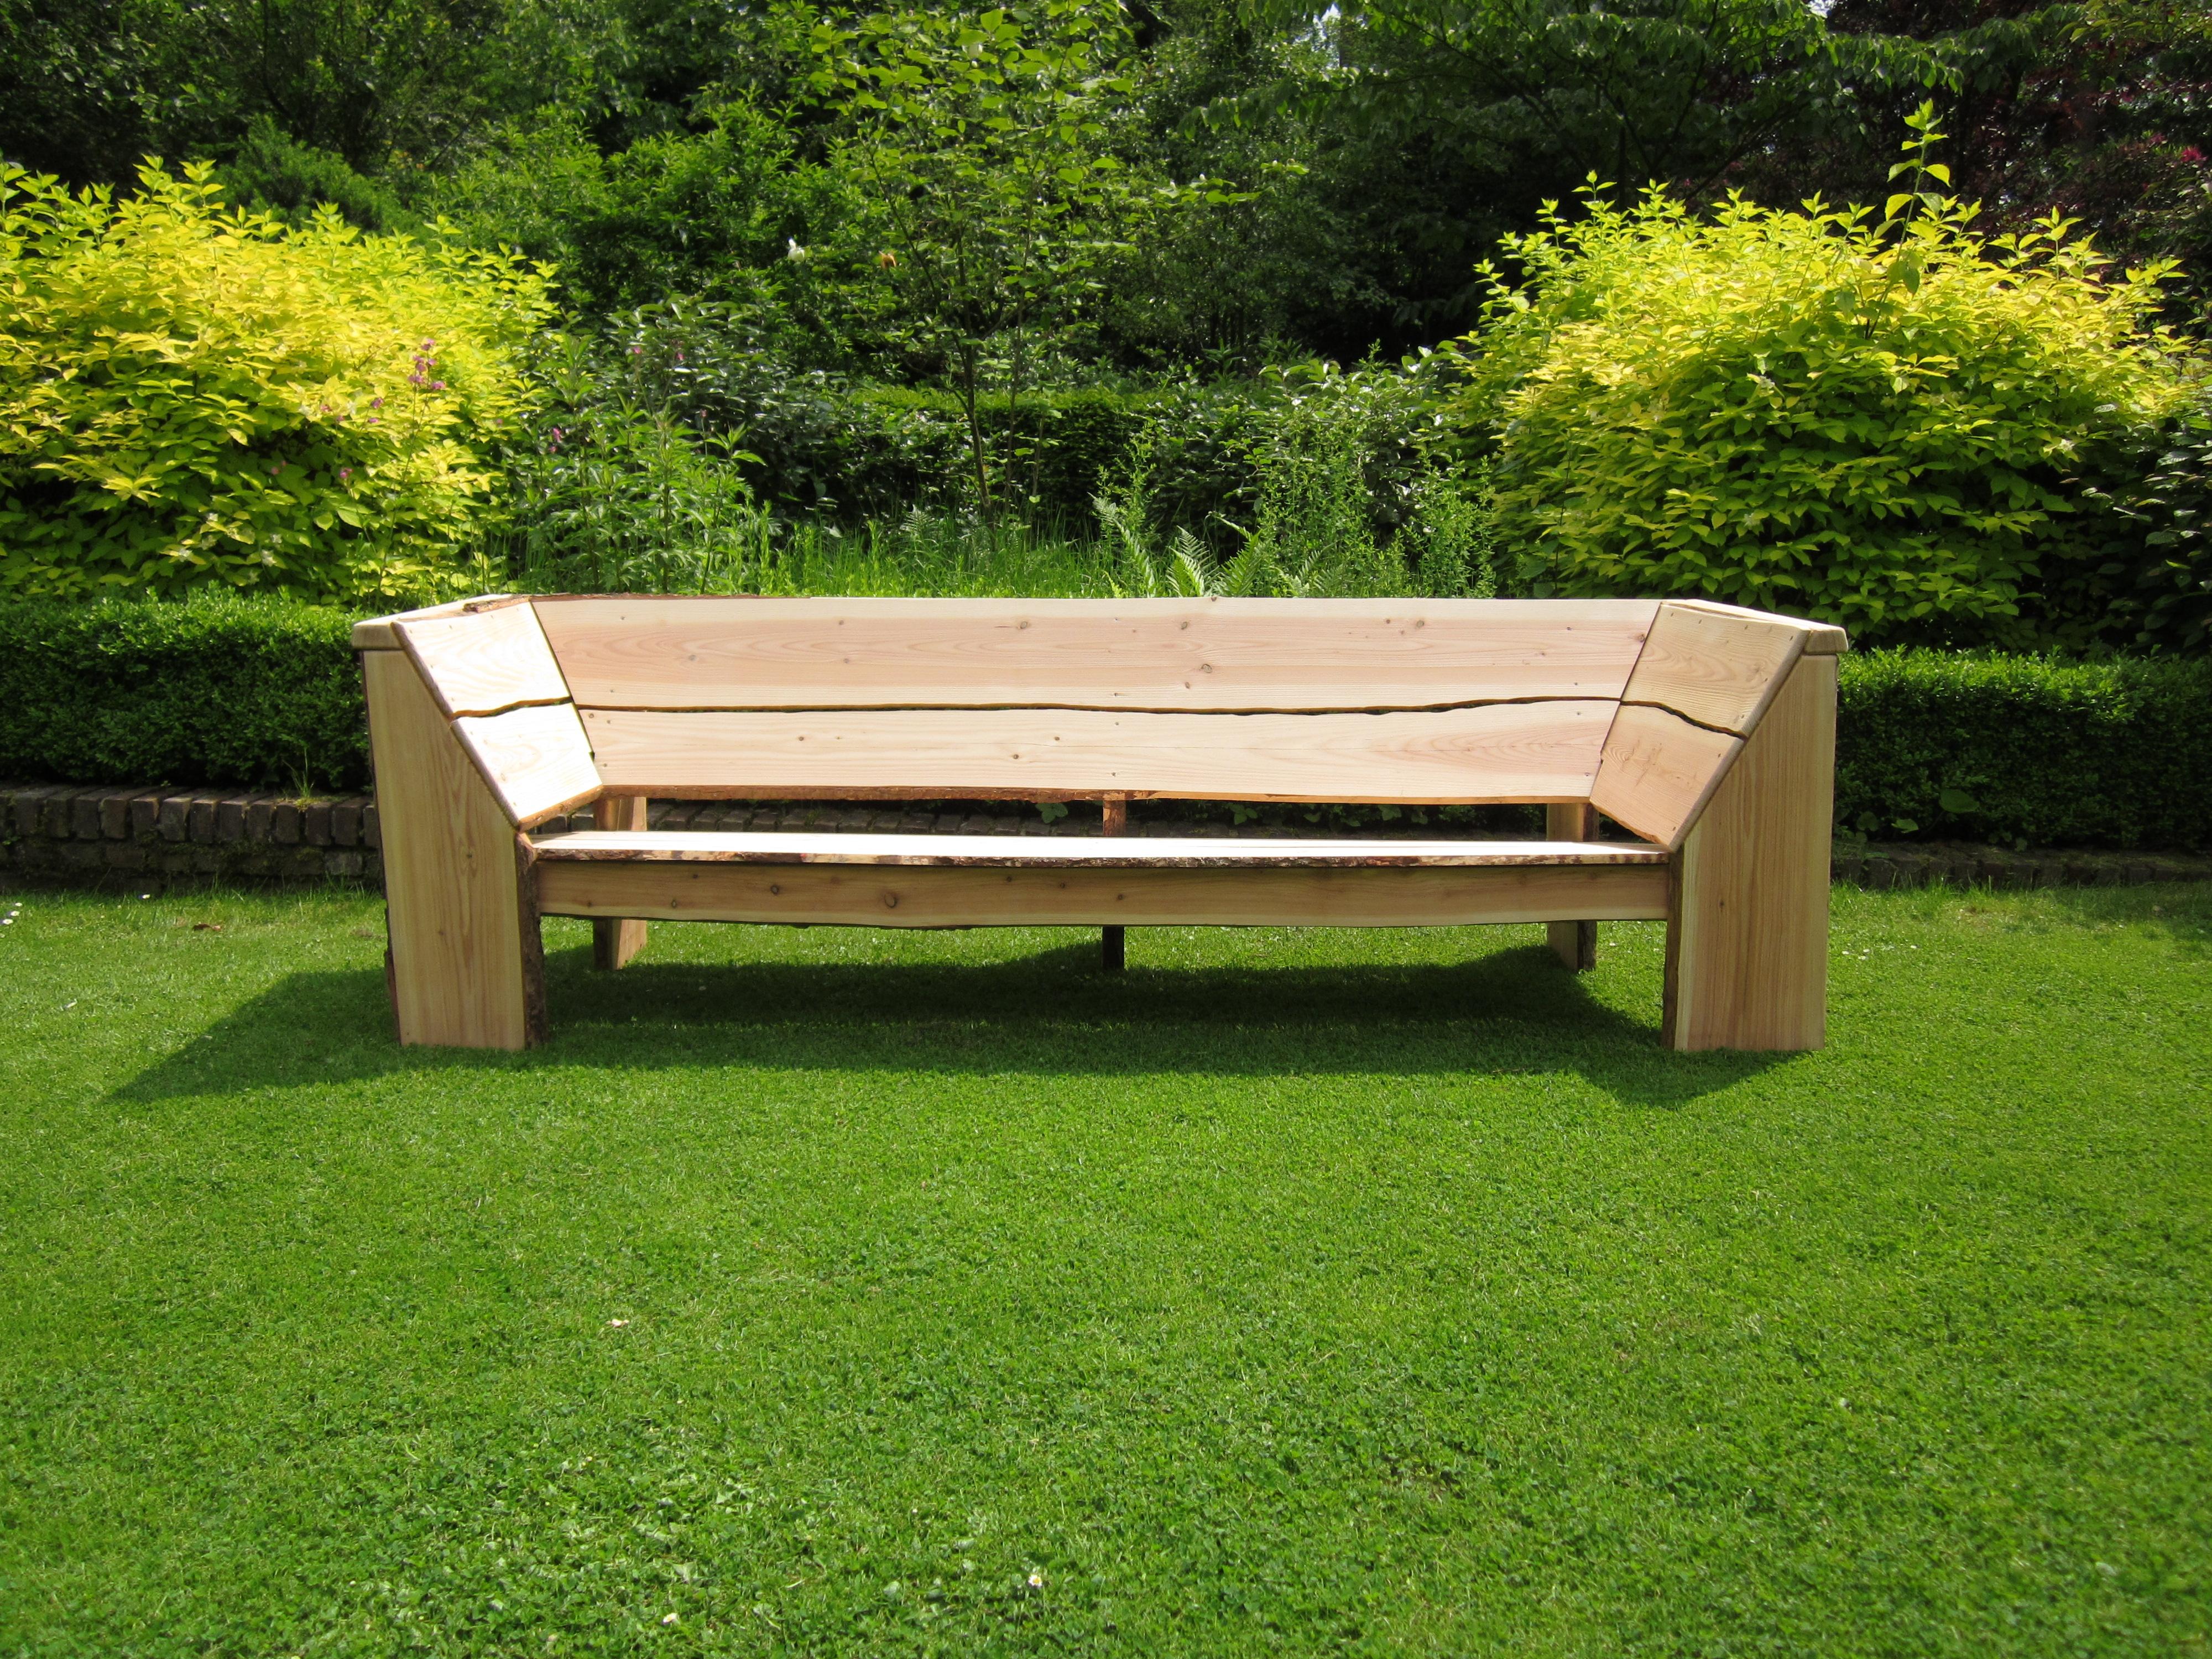 Excusieve meubelen archives houten design tuinmeubelen - Buiten image outs ...